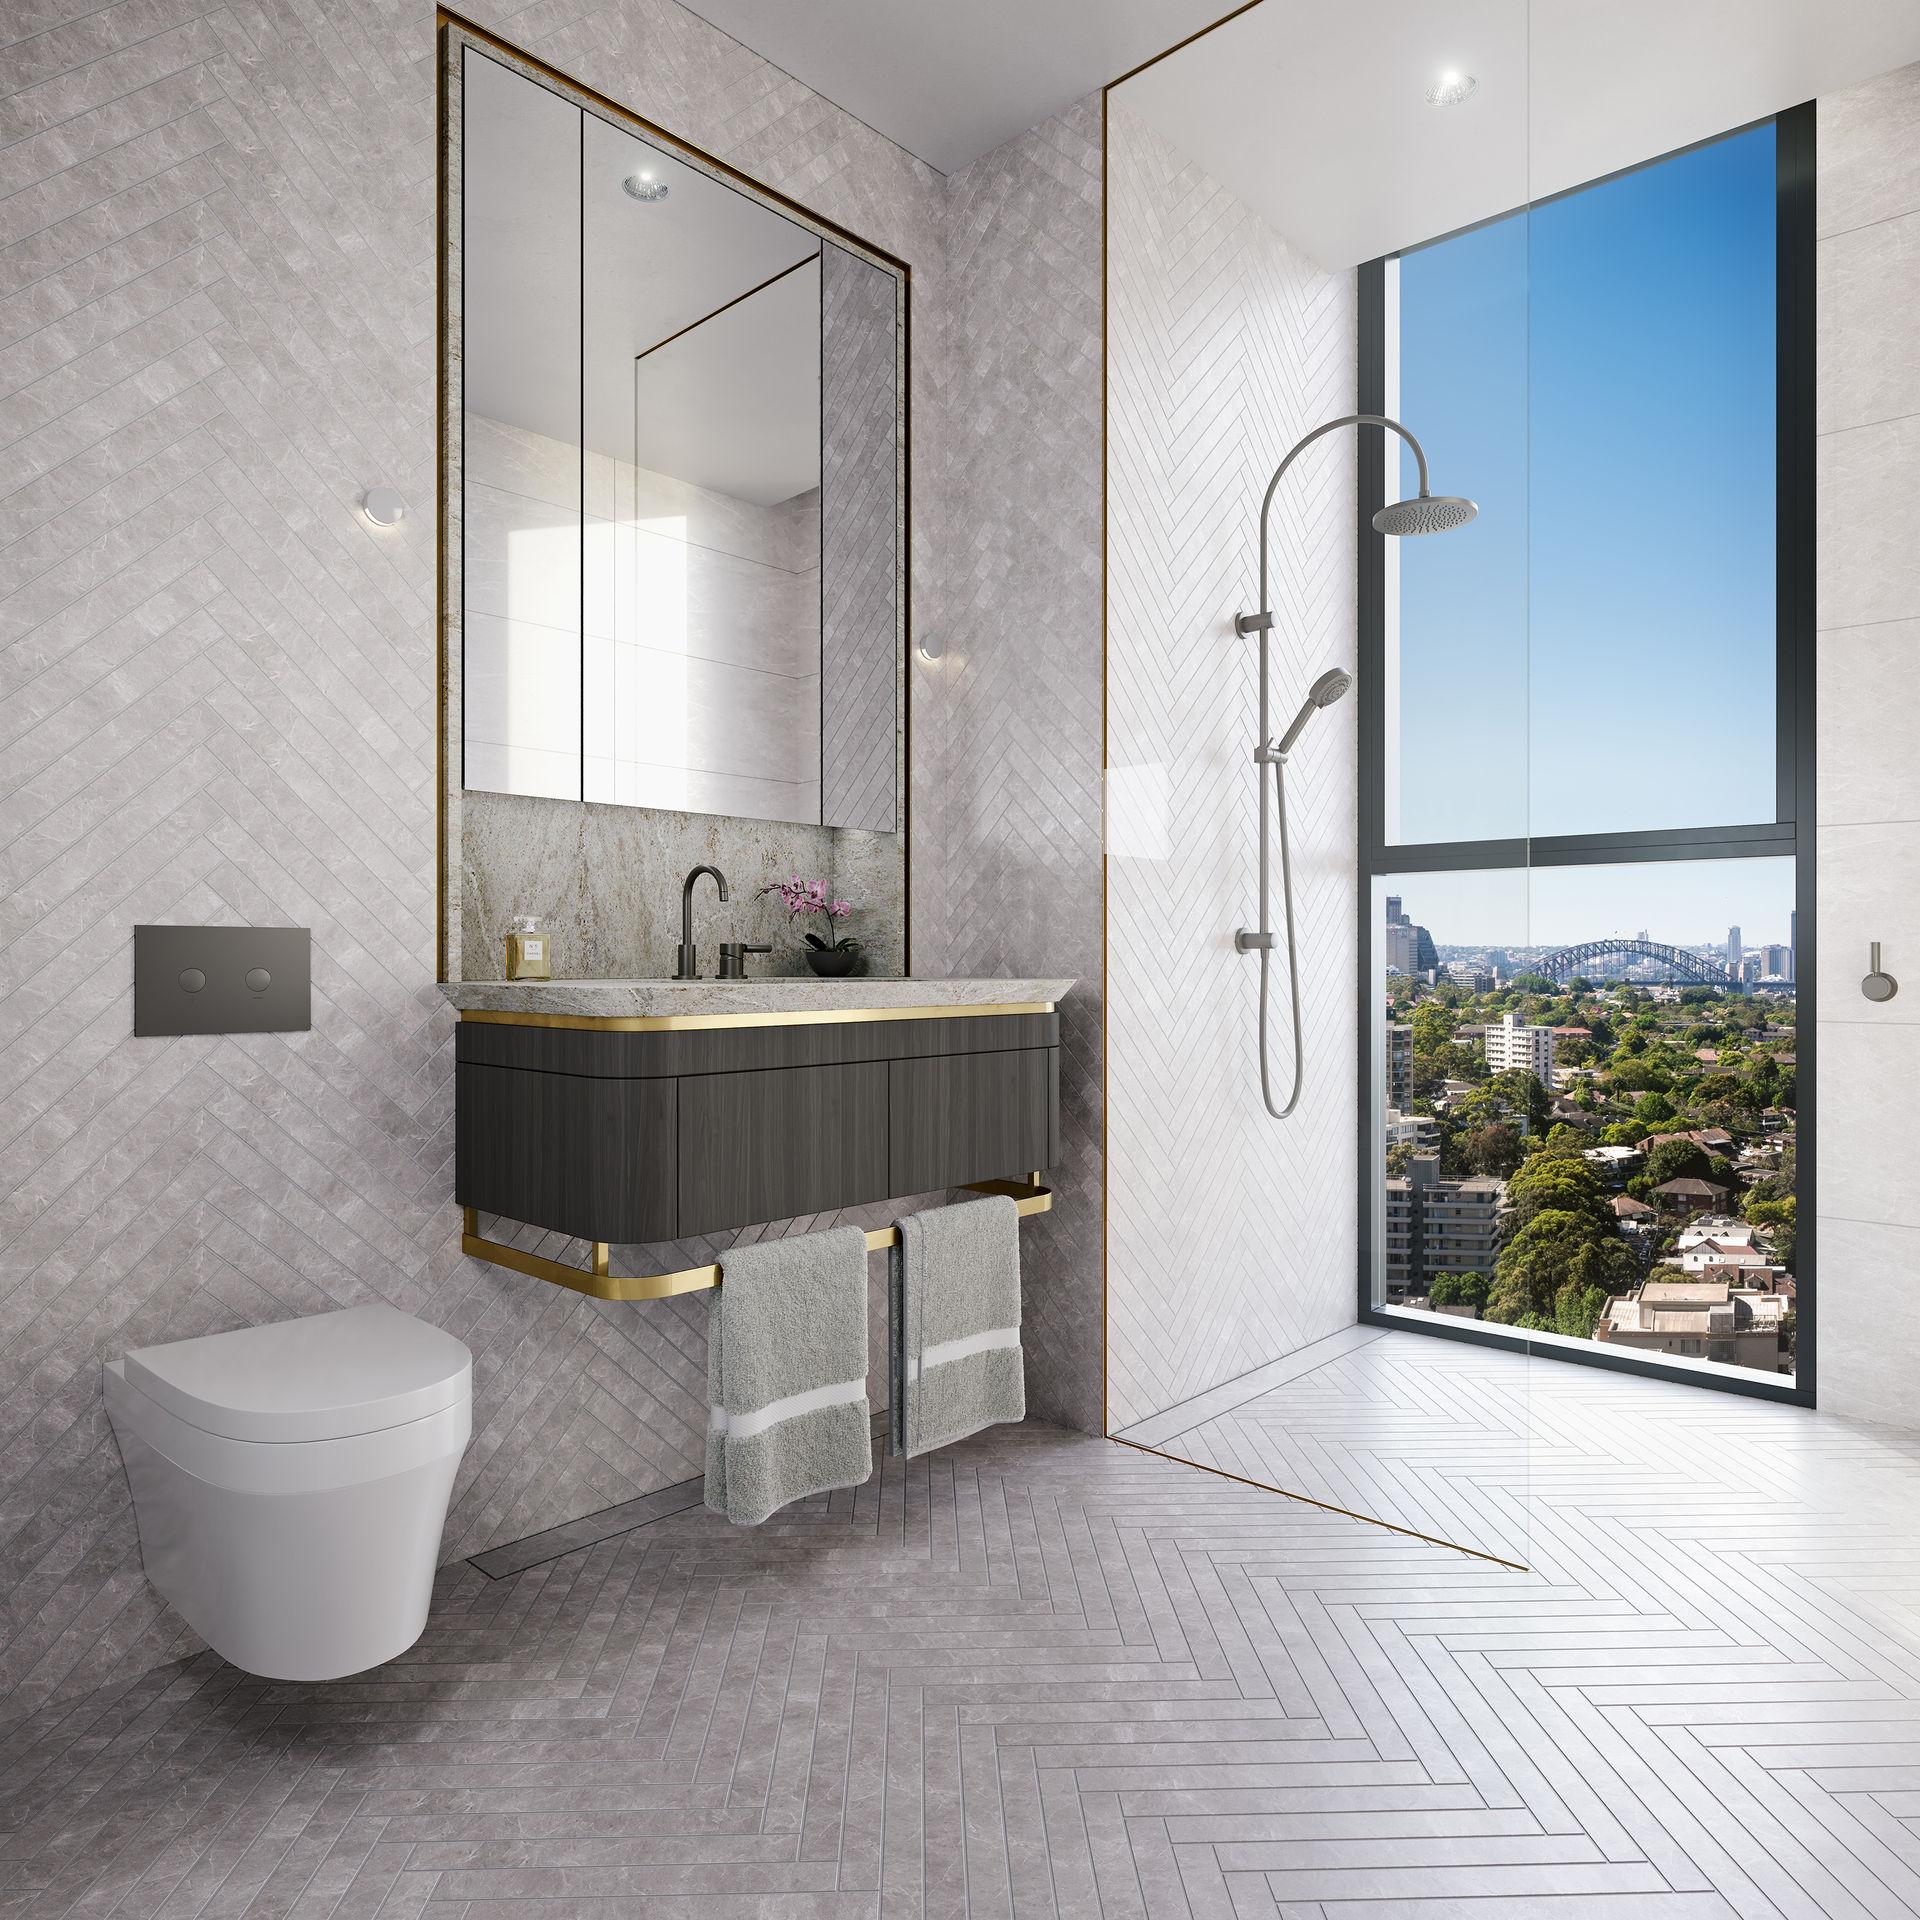 88Christie_View_12A_Bathroom FINAL.jpg